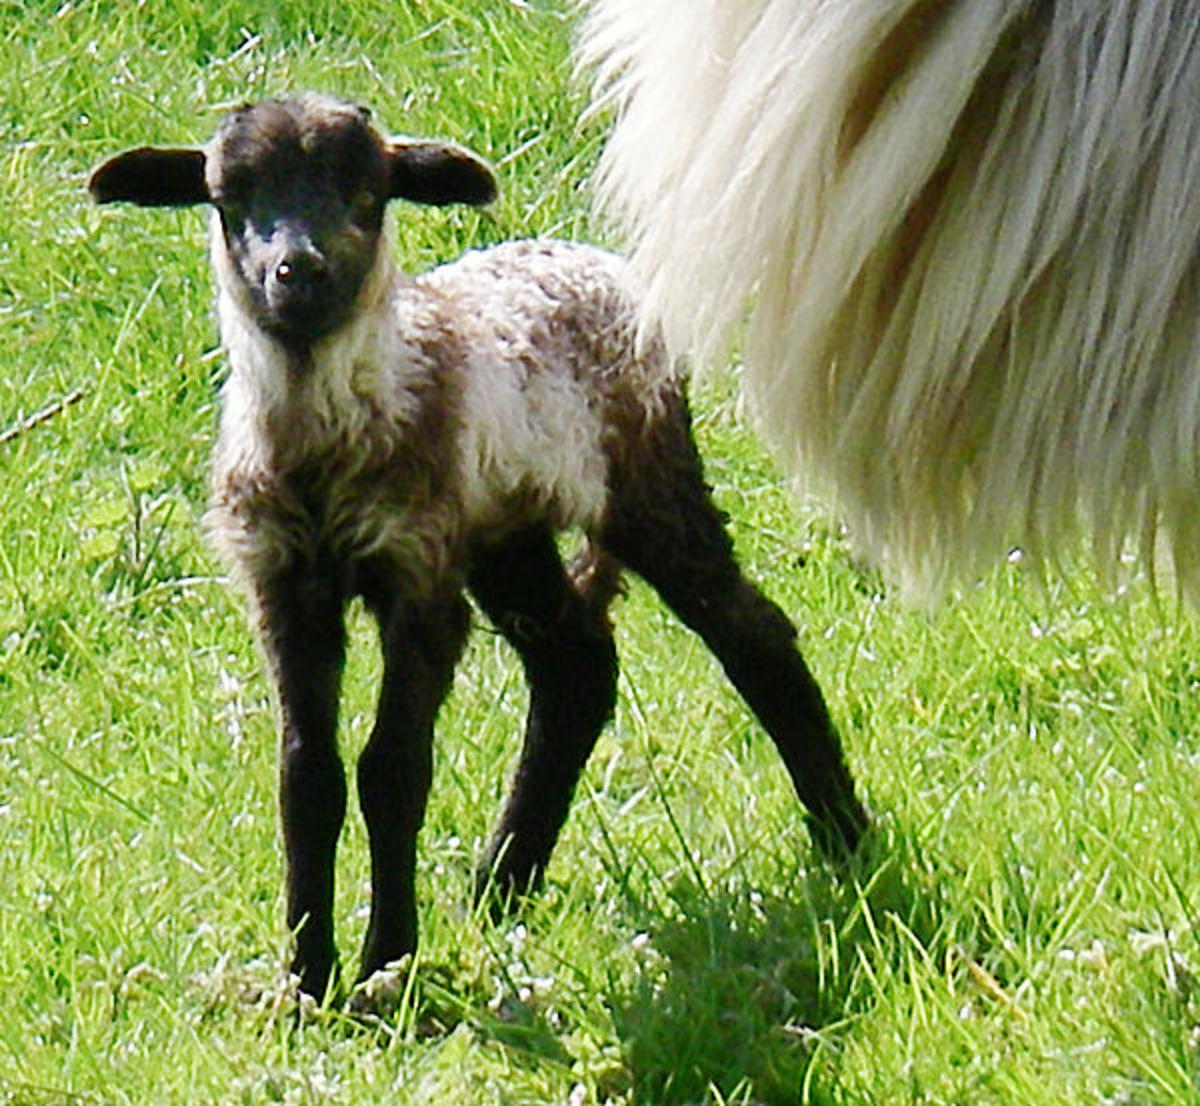 Lamb Ping, 4 days old